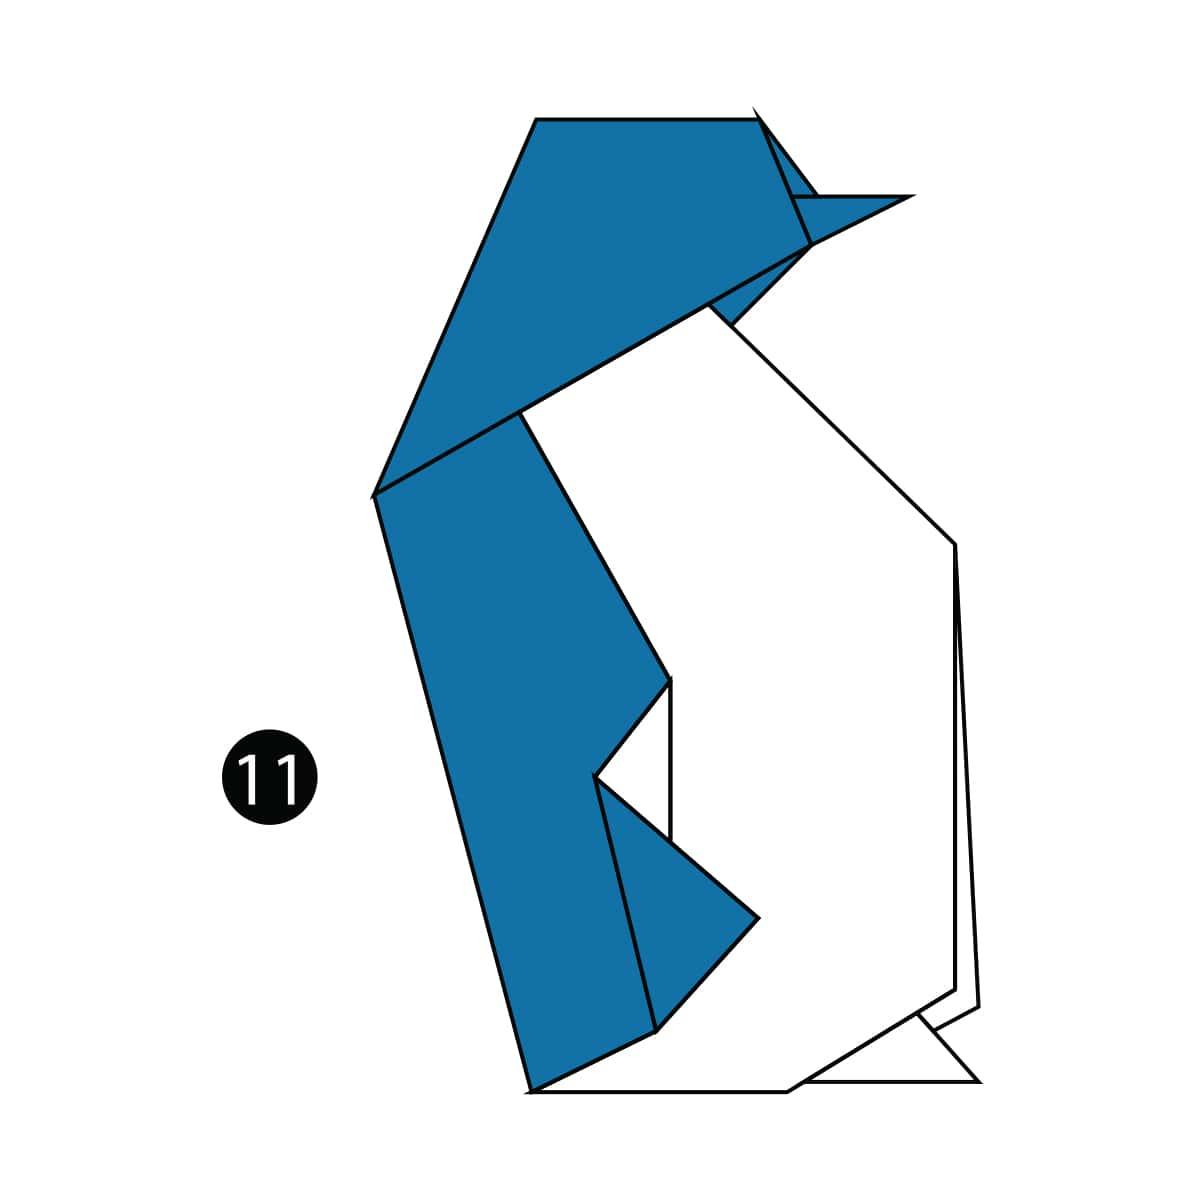 Penguin Step 11